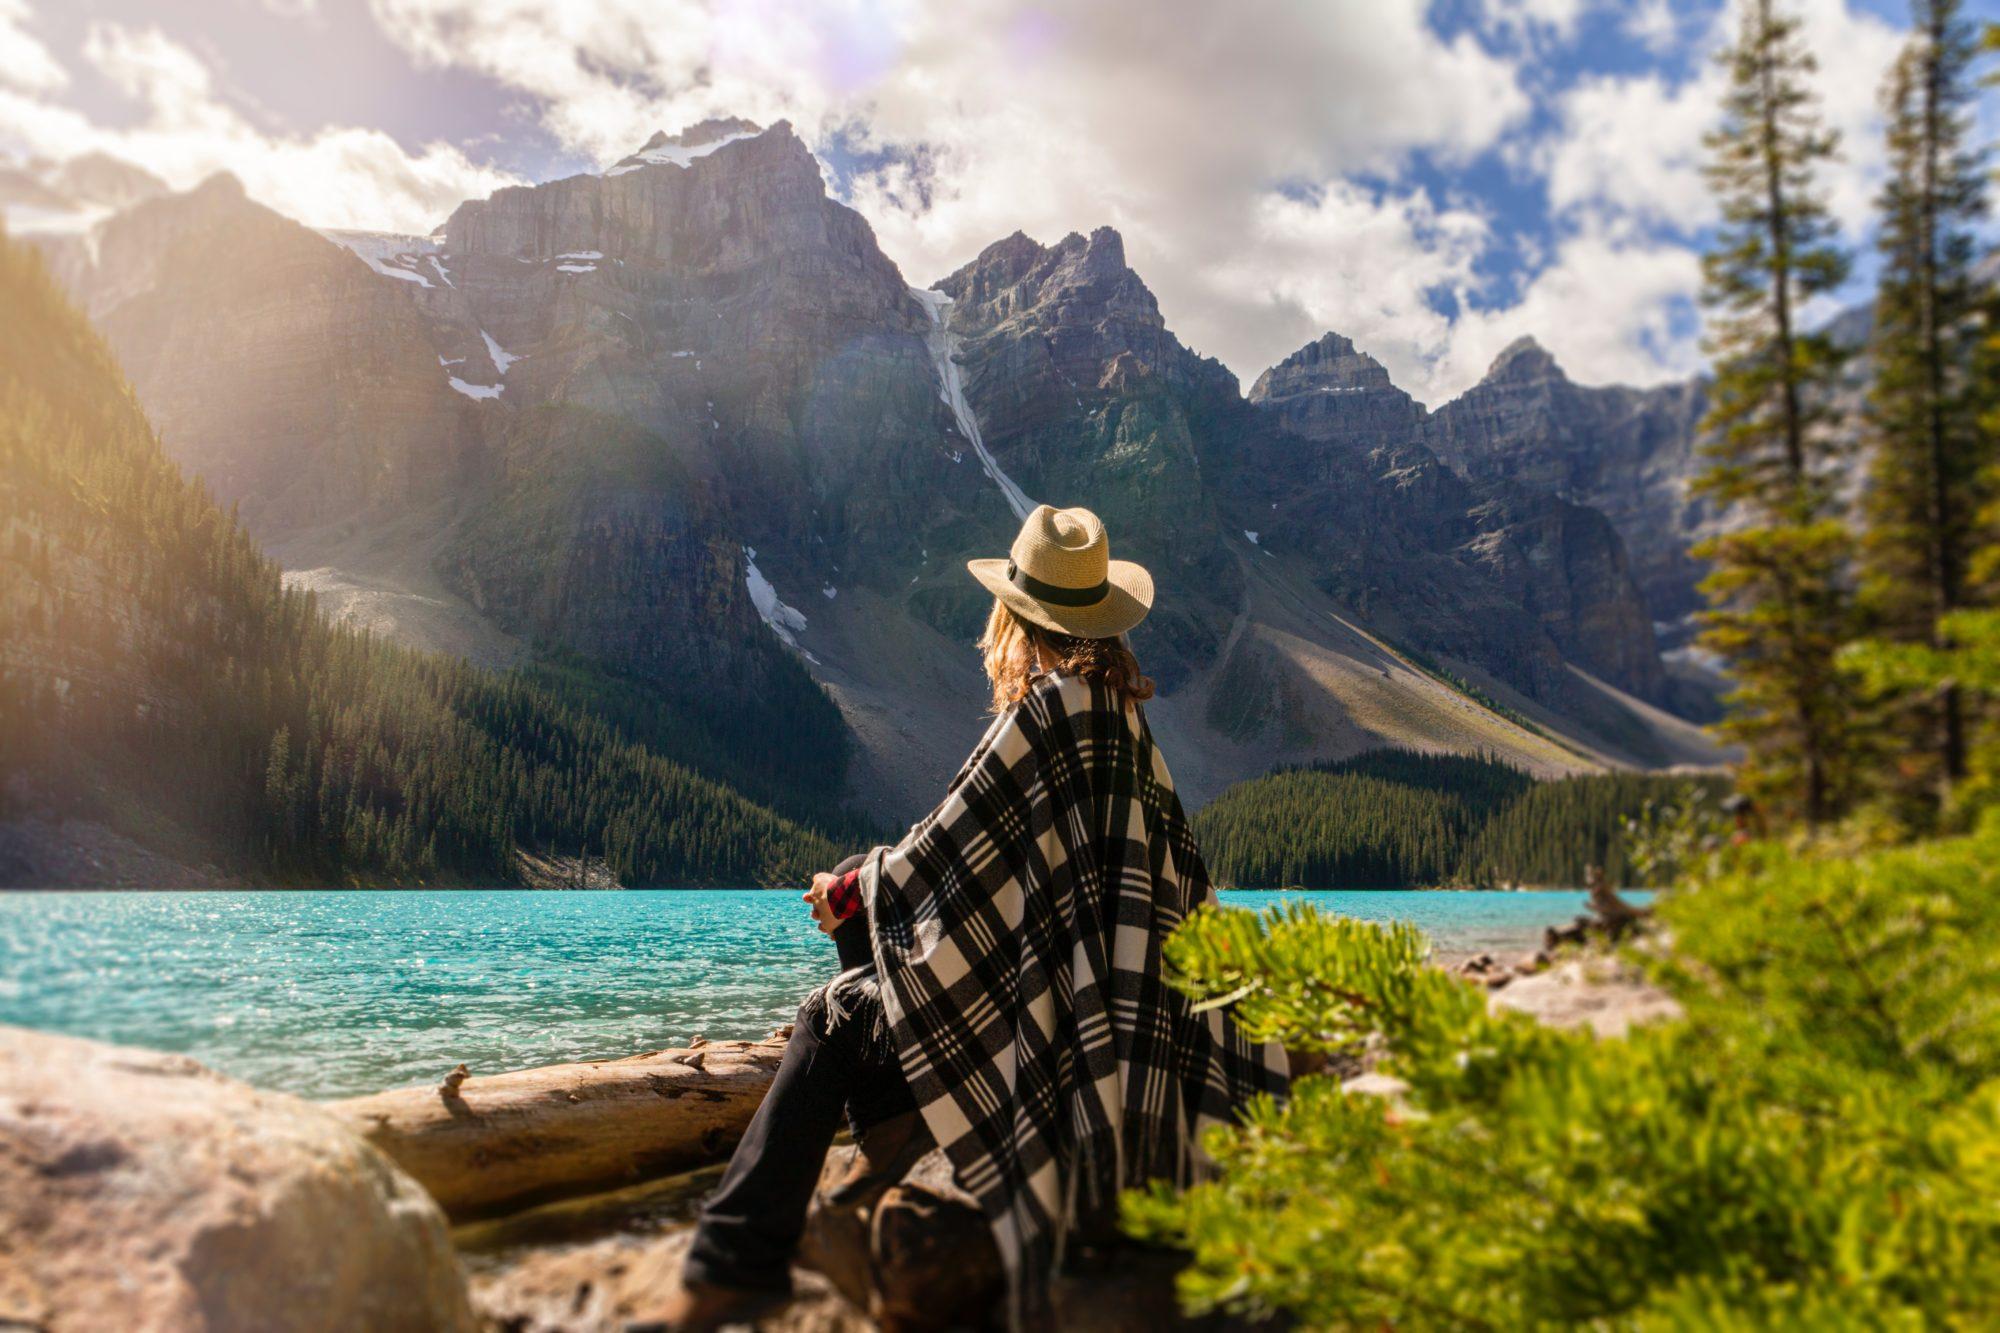 How Mindfulness Practice Can Help Heal Trauma